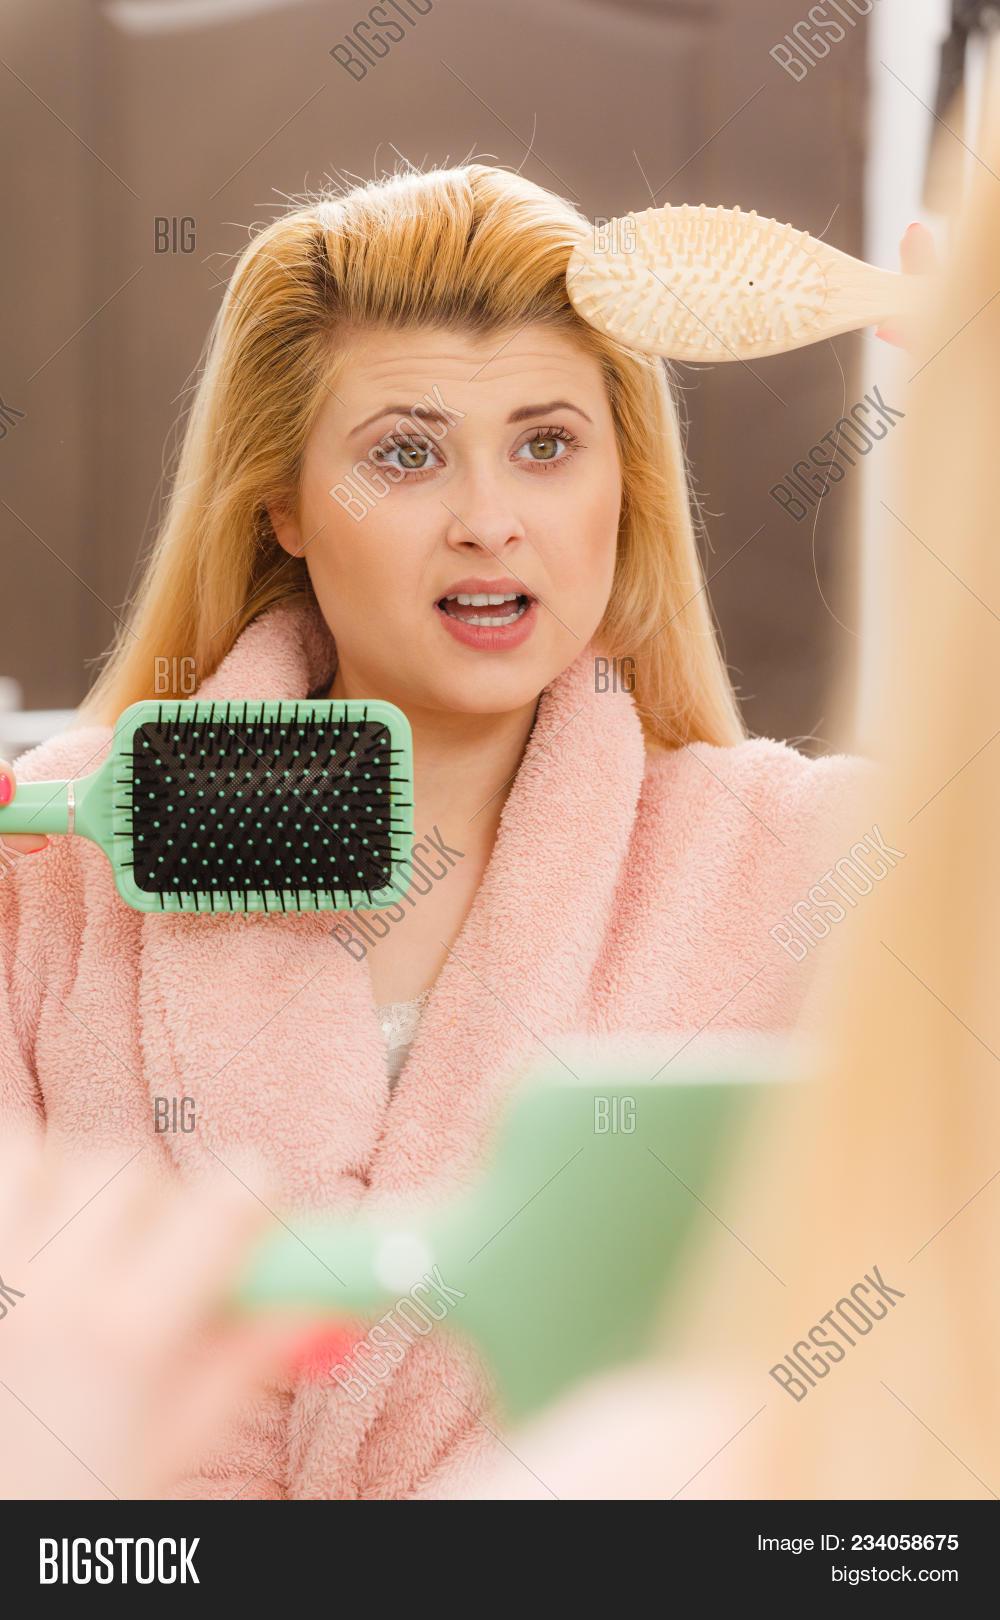 Woman Wearing Dressing Image & Photo (Free Trial) | Bigstock